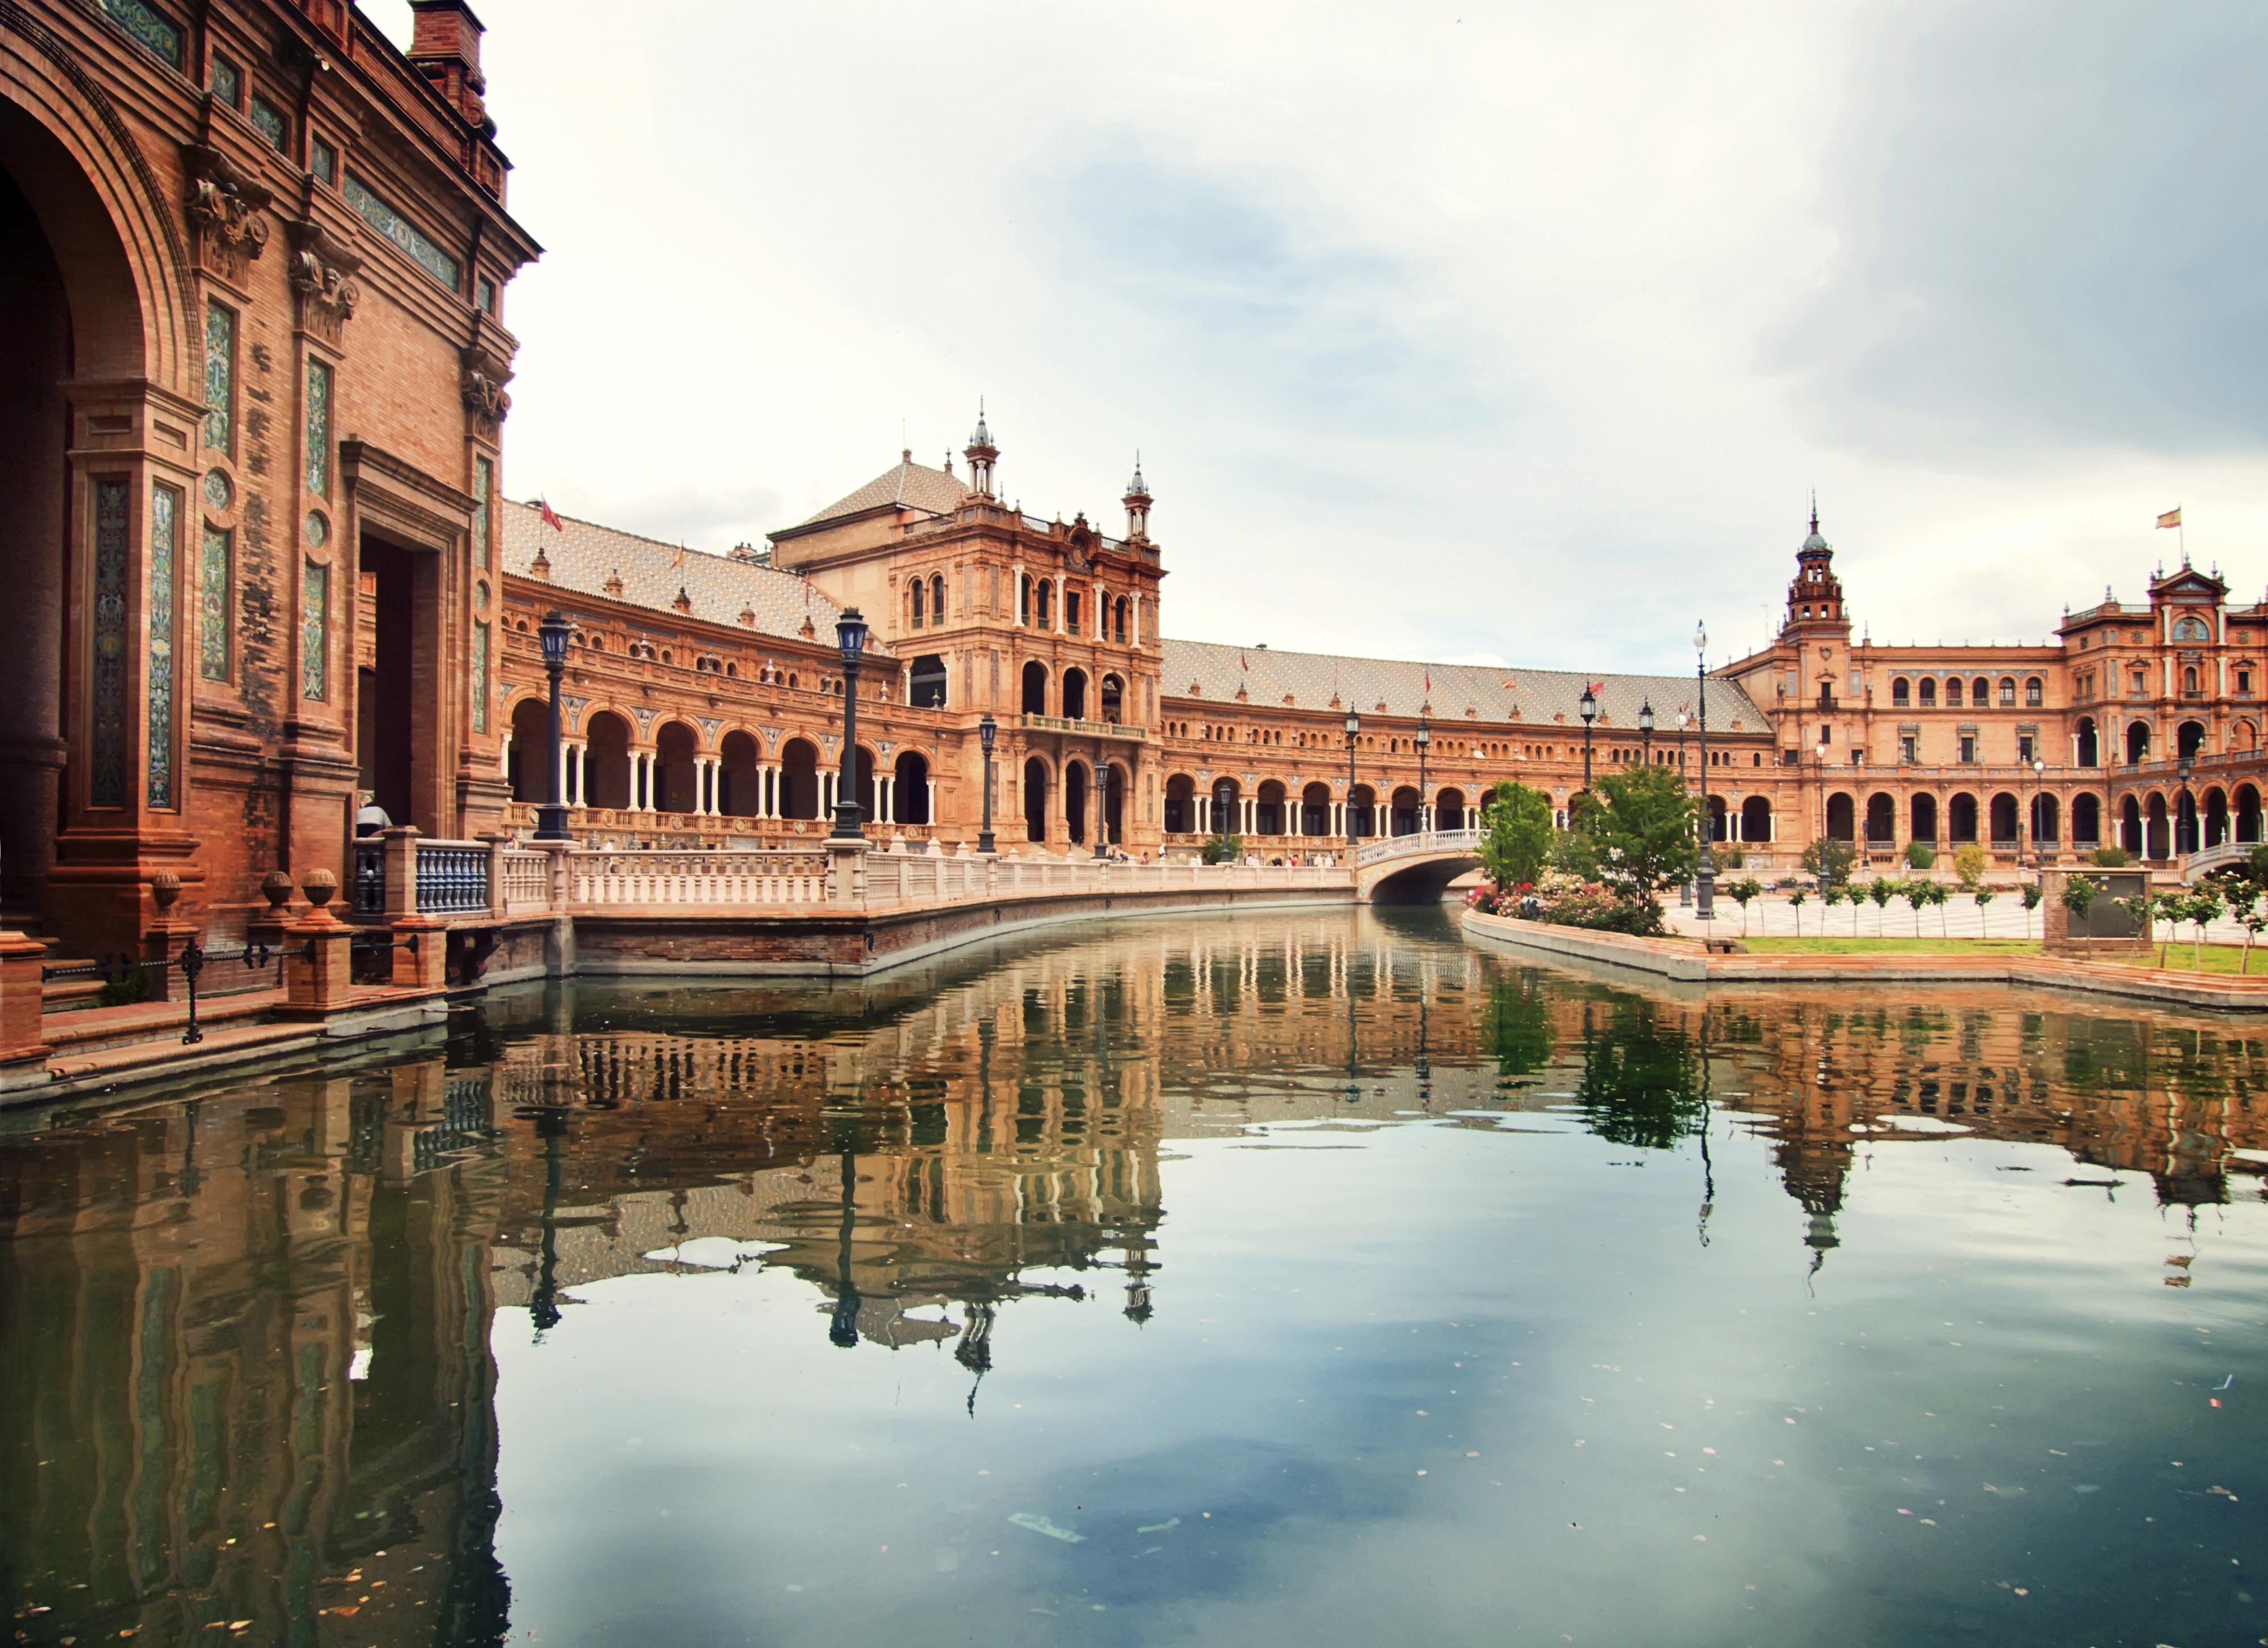 2. Sierra Norte de Sevilla